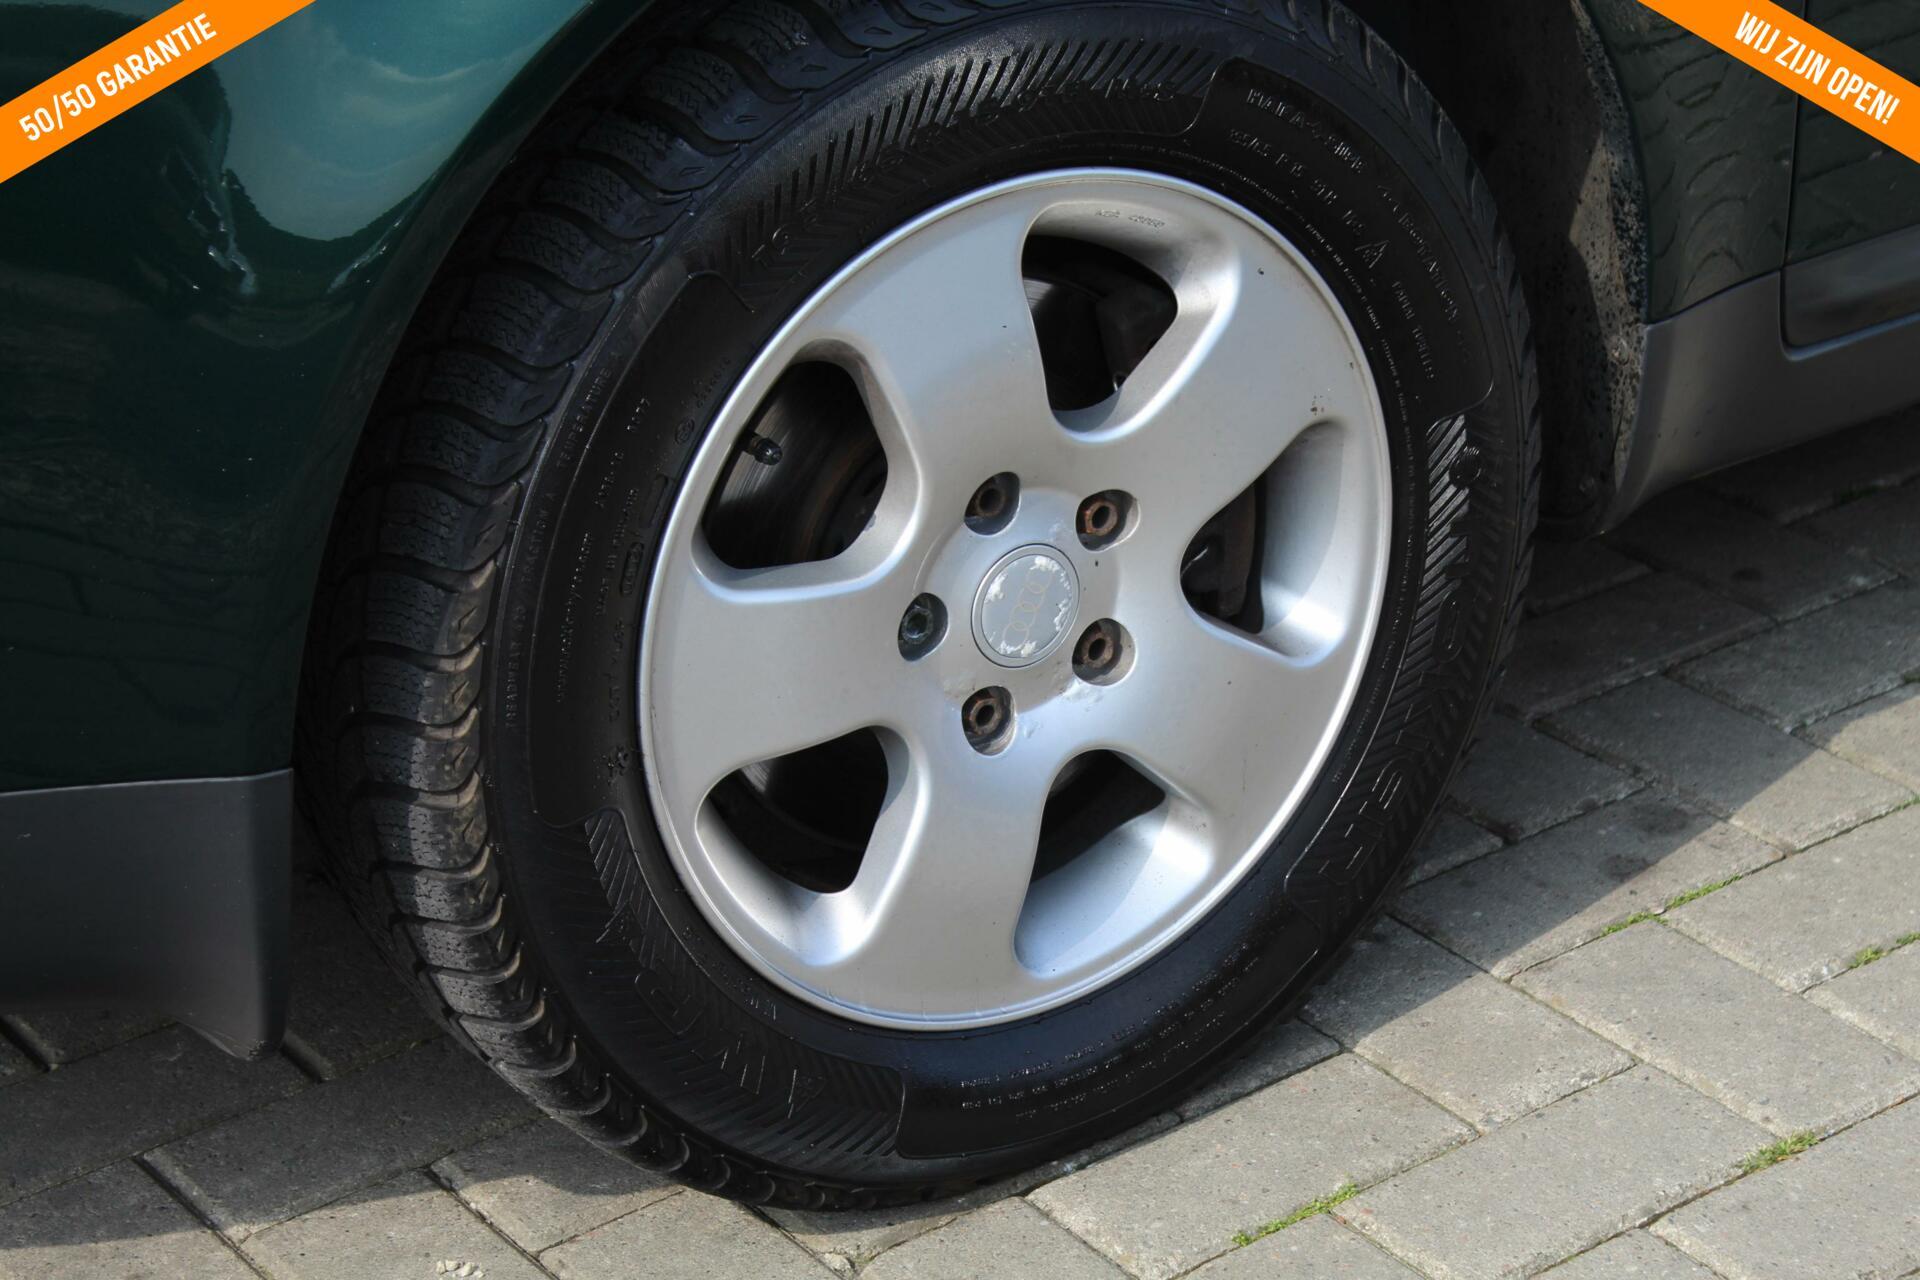 Caroutlet Groningen - Audi A6 2.8 5V 193pk quattro Advance | V6 | CLIMA | YOUNGTIMER